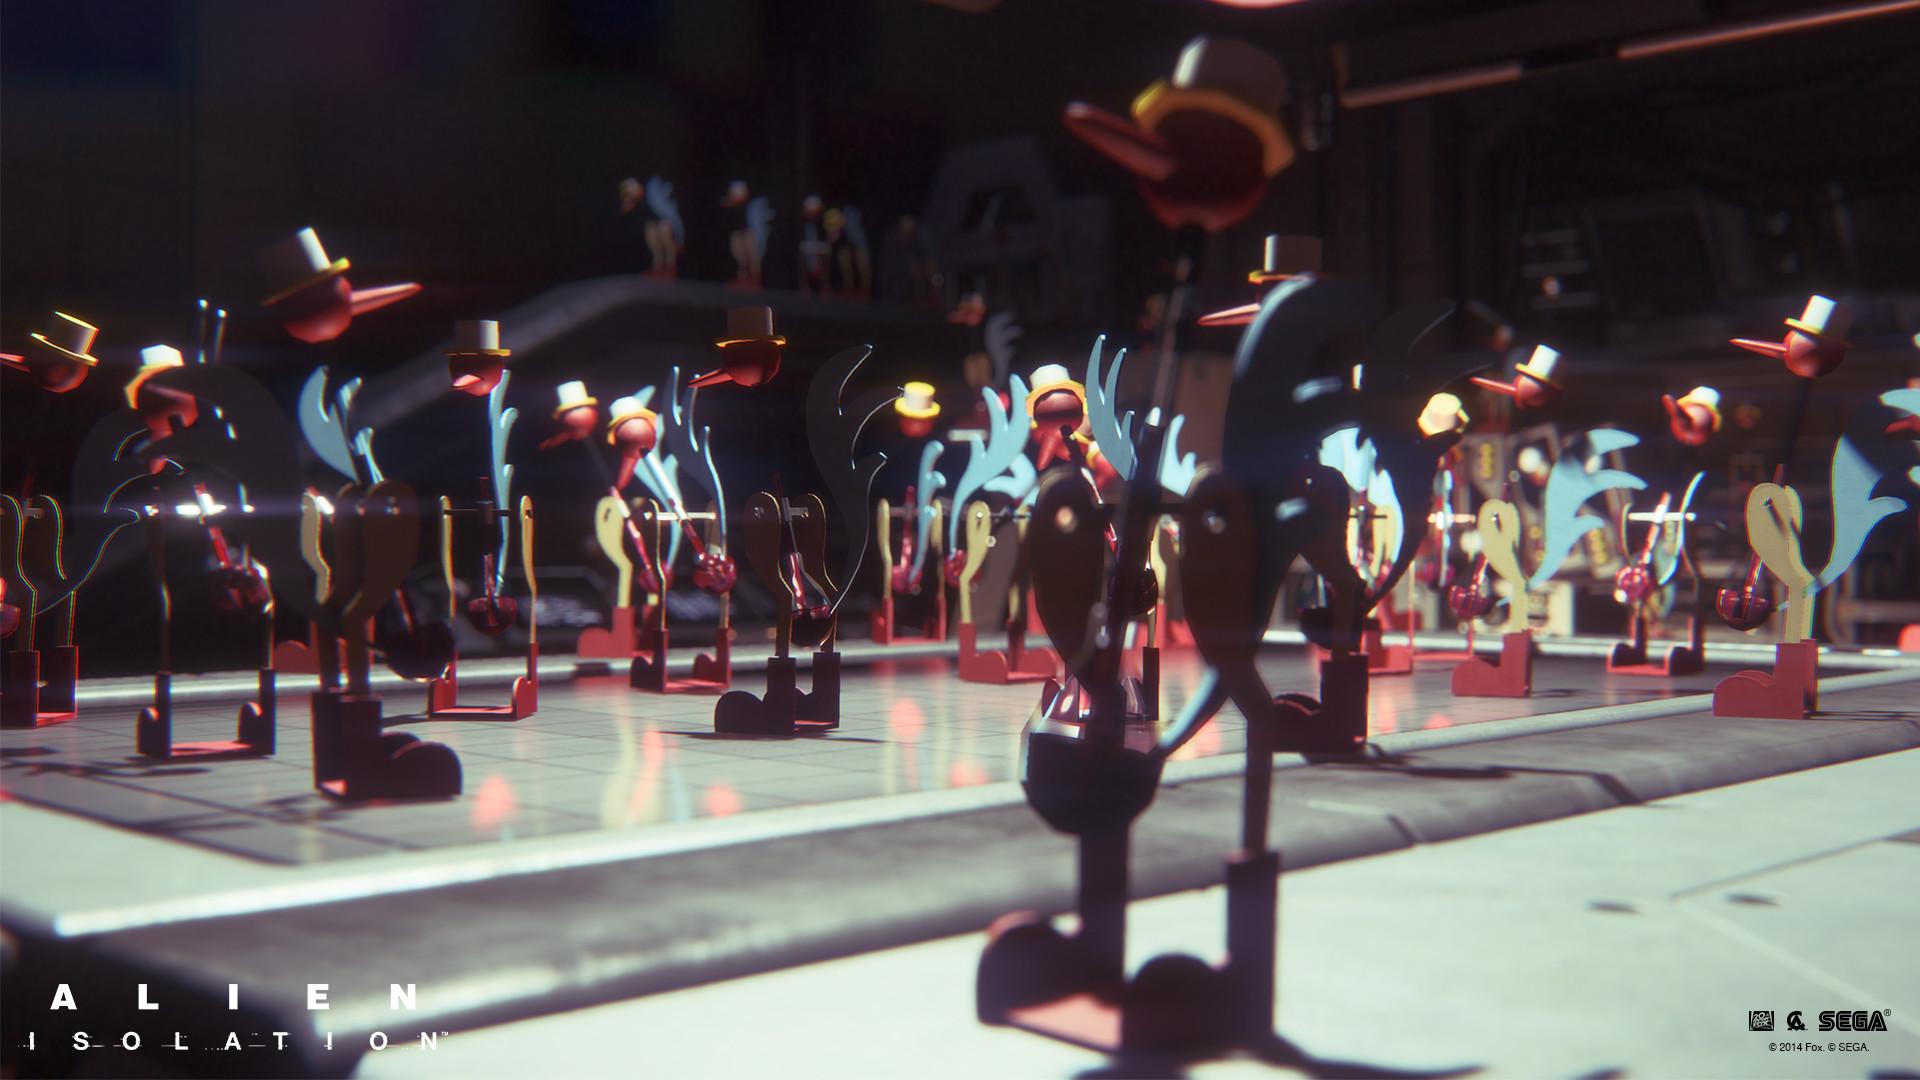 Video Game – Alien: Isolation Bakgrund